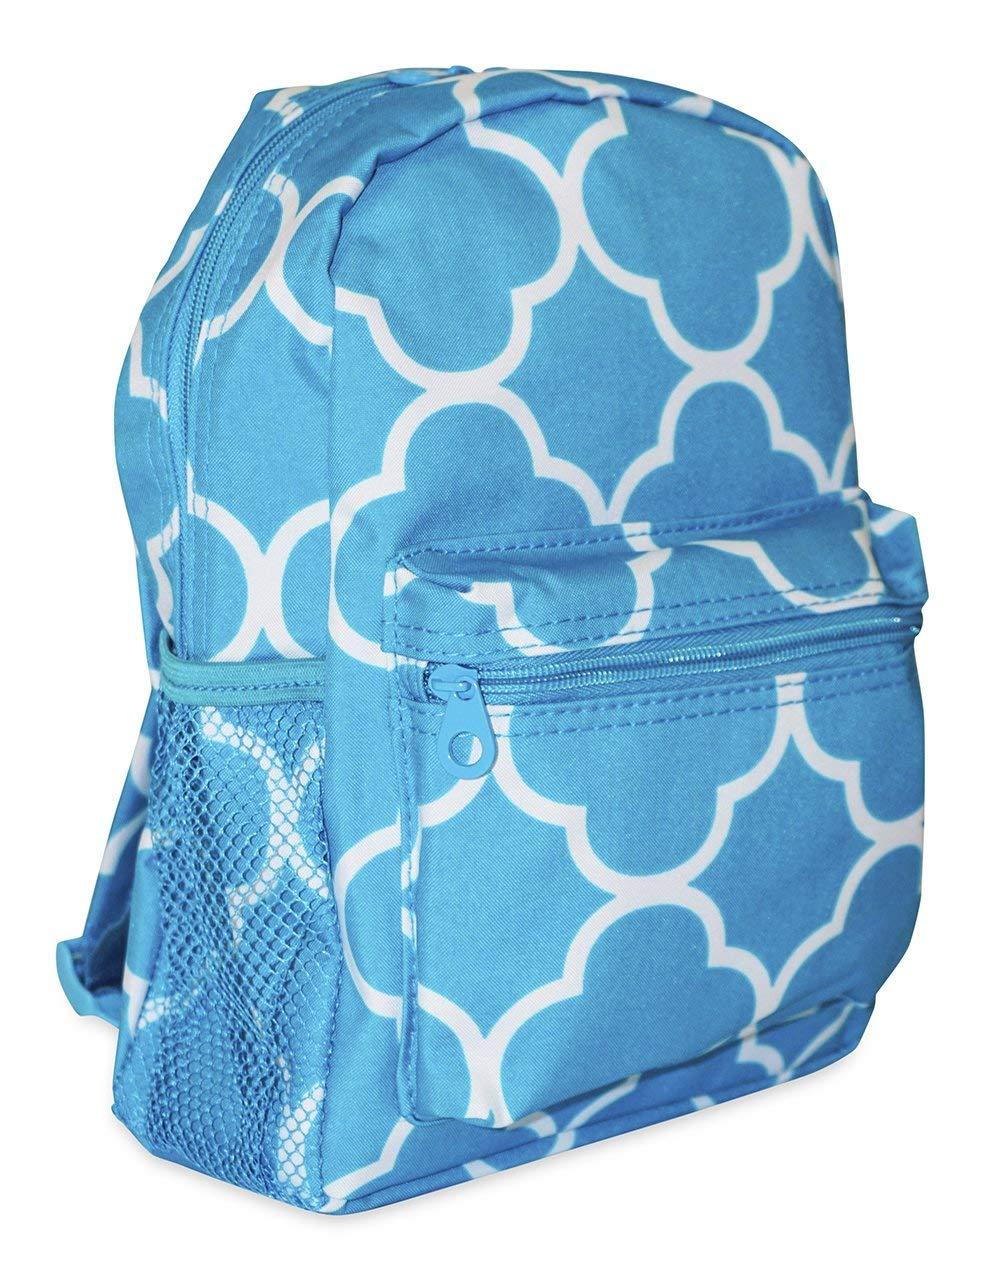 Ever Moda Pull String Backpack 19-inch Royal Blue Quatrefoil Backpack